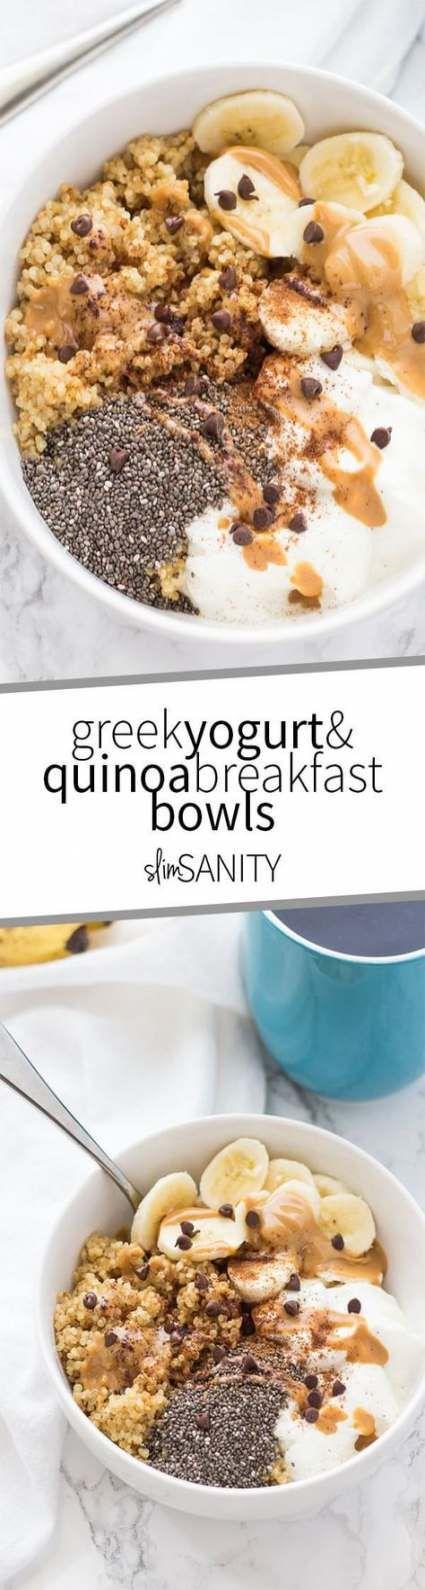 40+ ideas for fitness food healthy greek yogurt #food #fitness